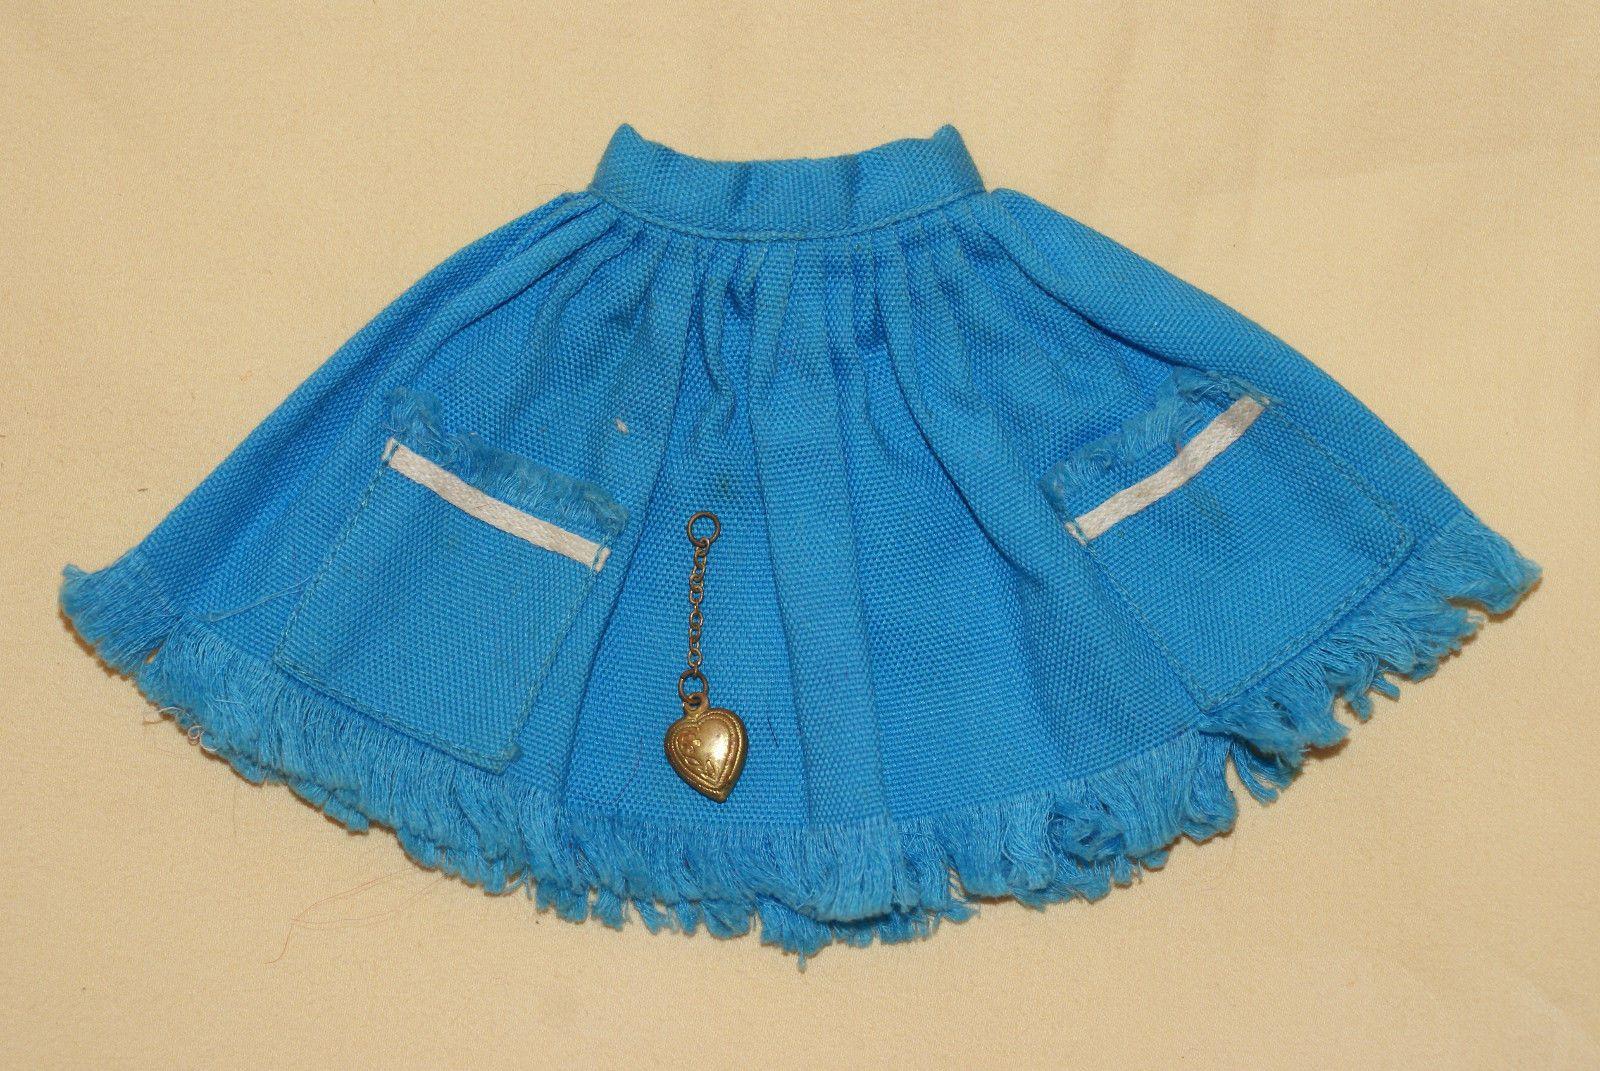 Tammy's Blue Skirt 9230 4 with Heart Shaped Locket | eBay